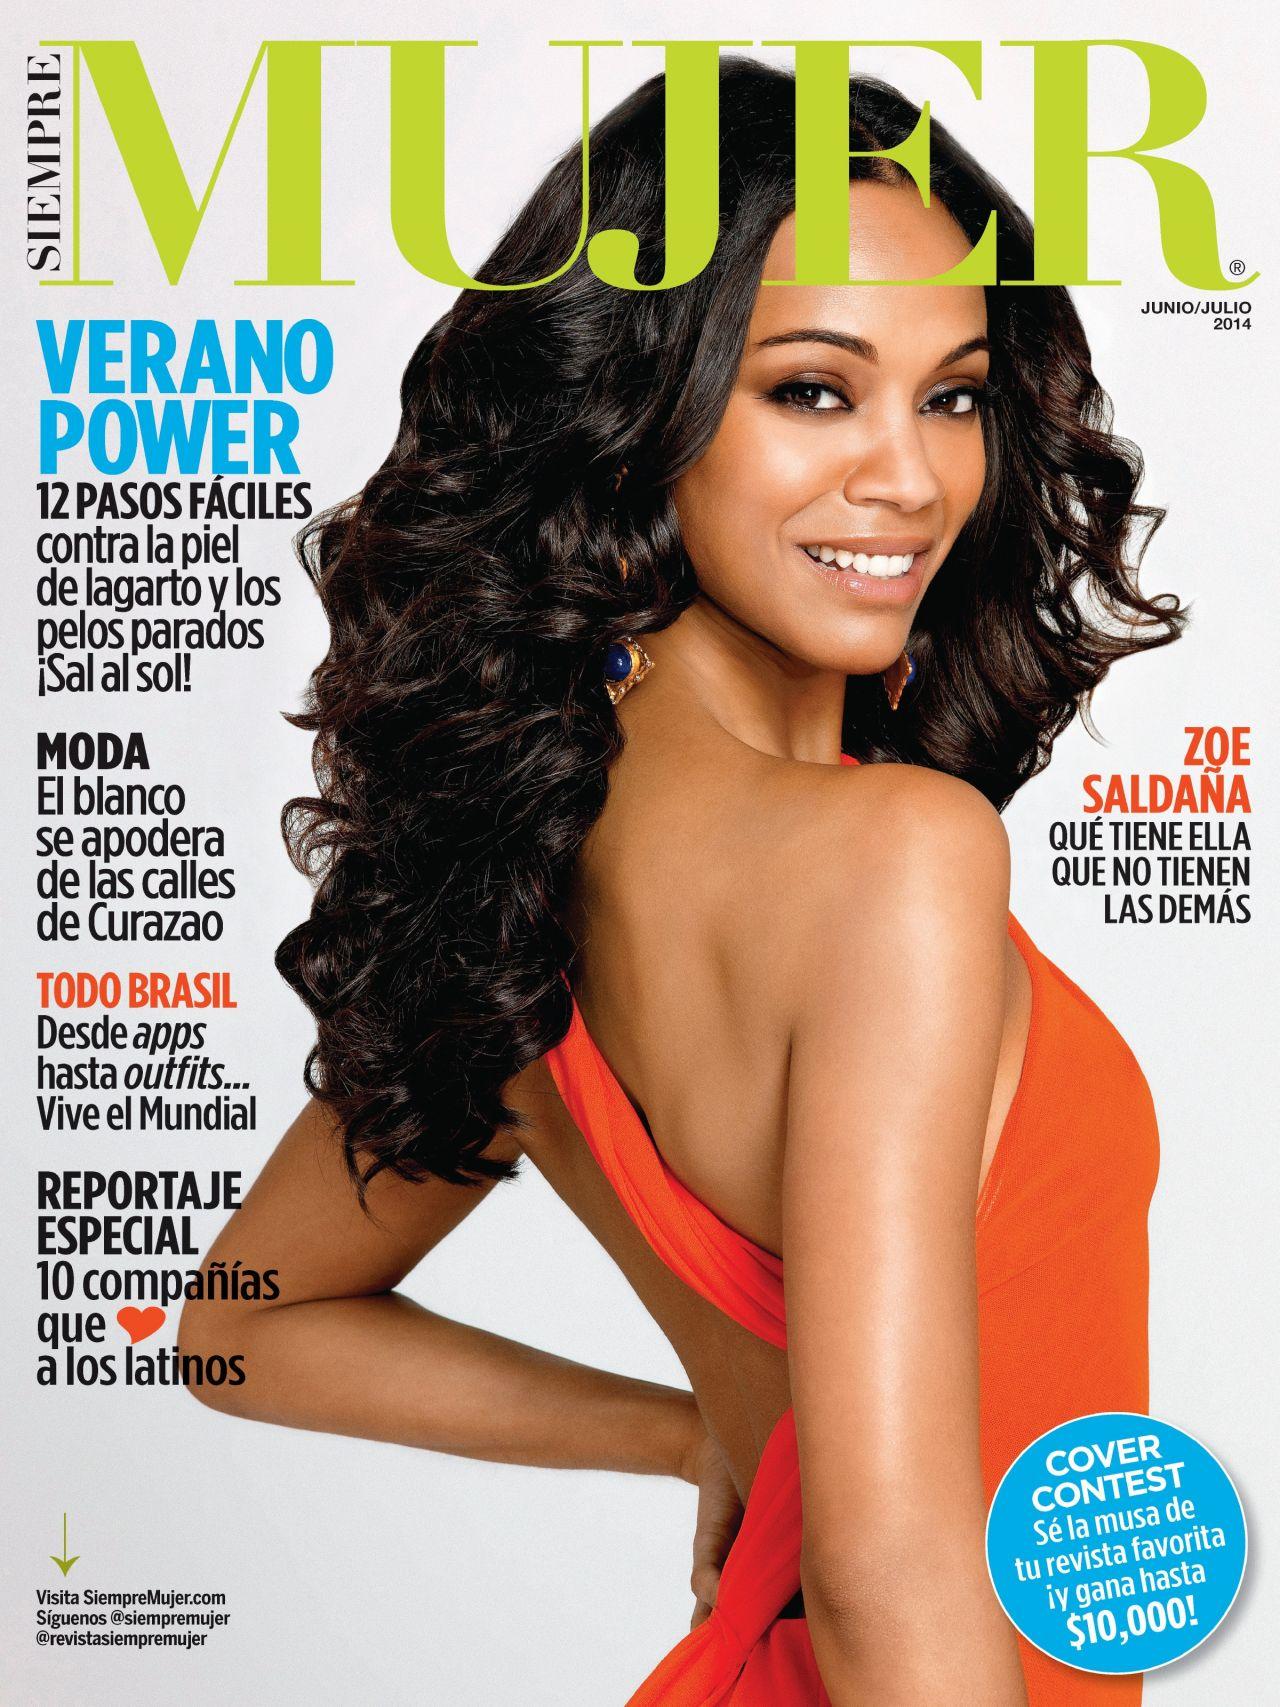 zoe-saldana-siempre-mujer-magazine-june-july-2014-issue_1